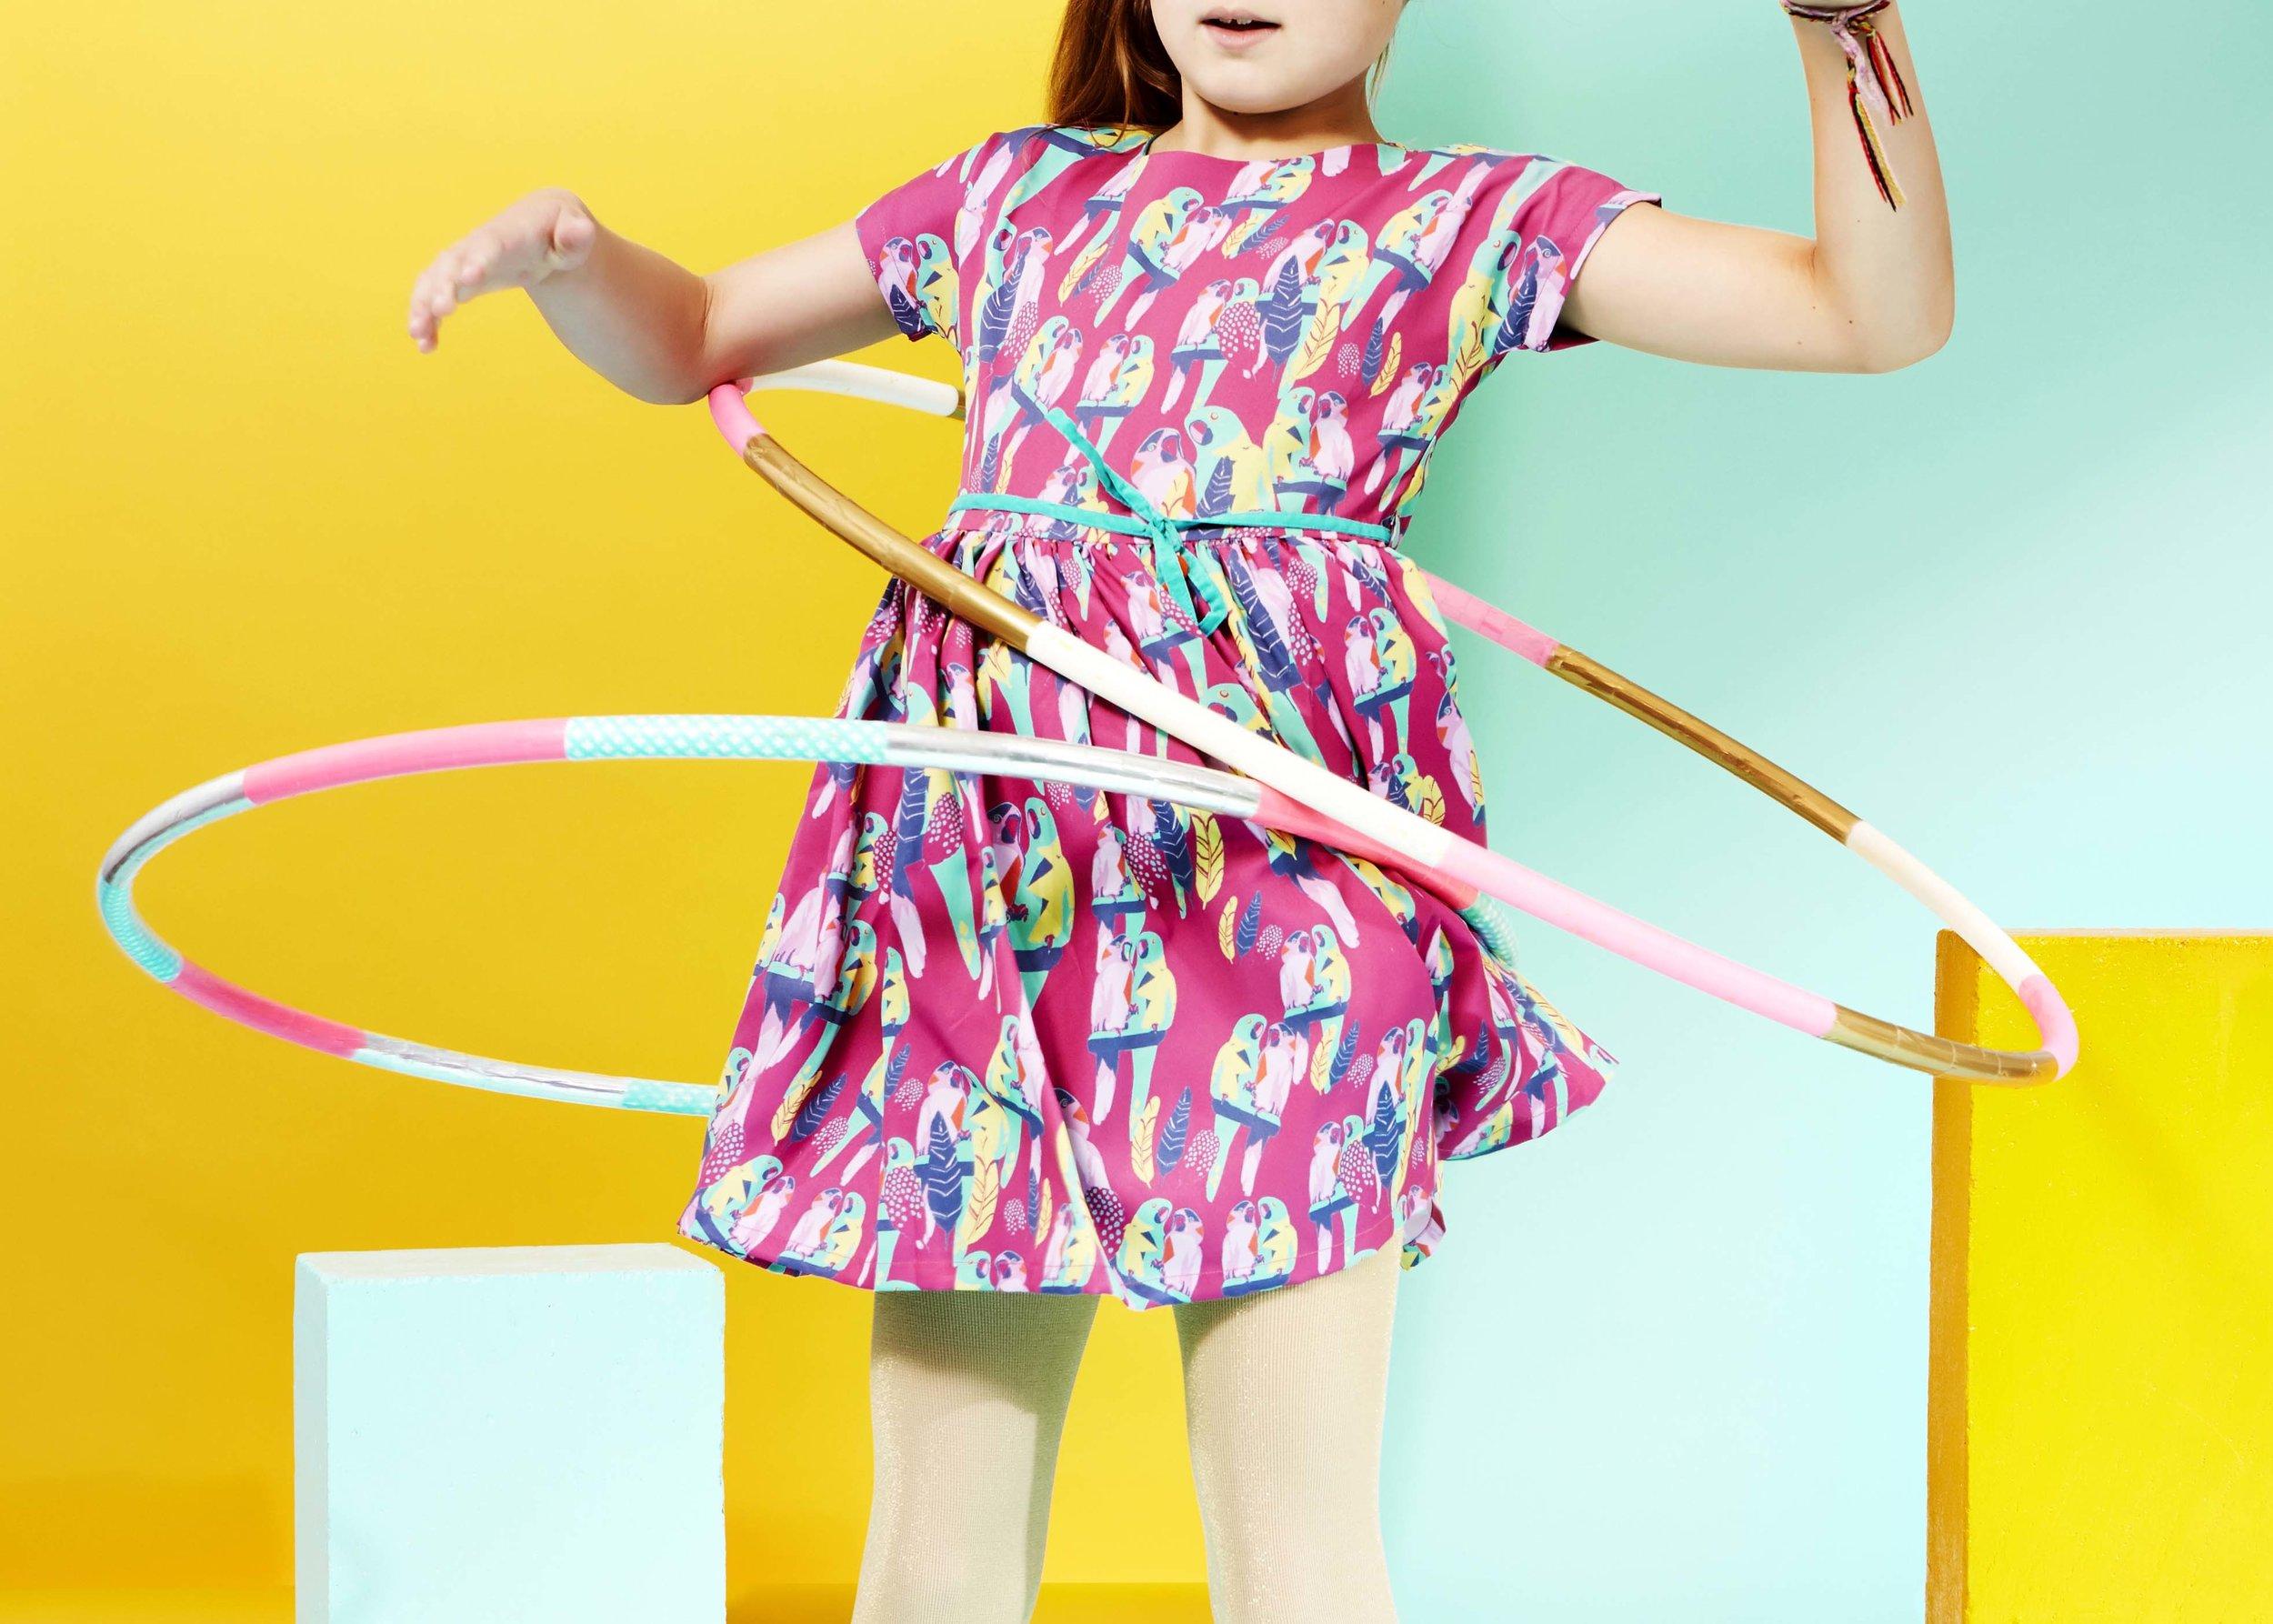 Liz_Cooper_Interior_Stylist_Styling_Kids_Fashion_Hula.jpg